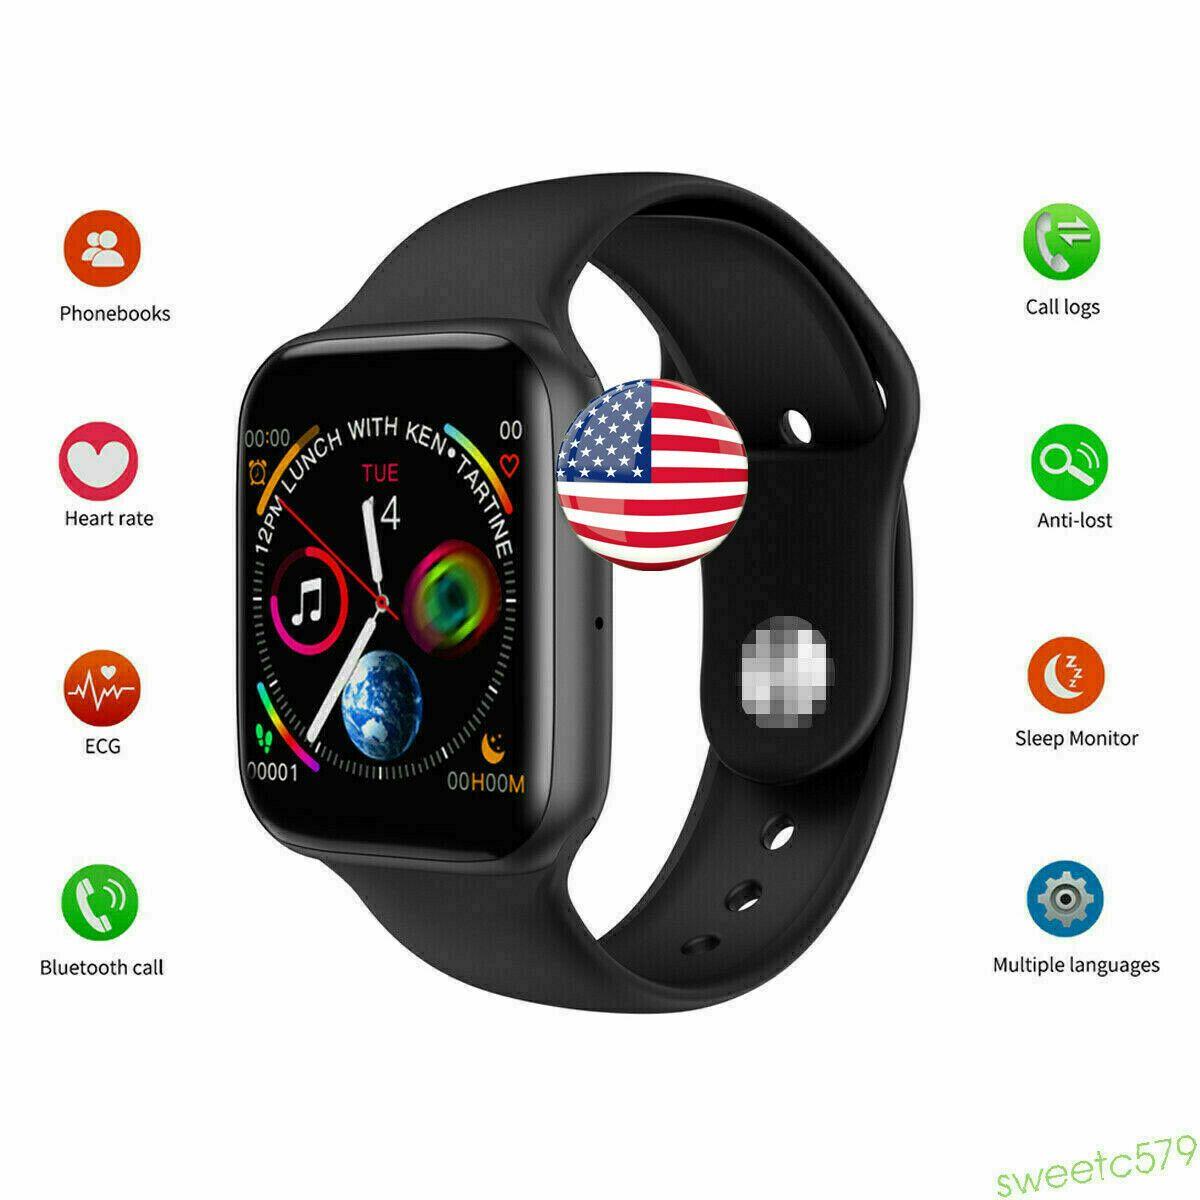 images?q=tbn:ANd9GcQh_l3eQ5xwiPy07kGEXjmjgmBKBRB7H2mRxCGhv1tFWg5c_mWT Smart Watch Project Pdf